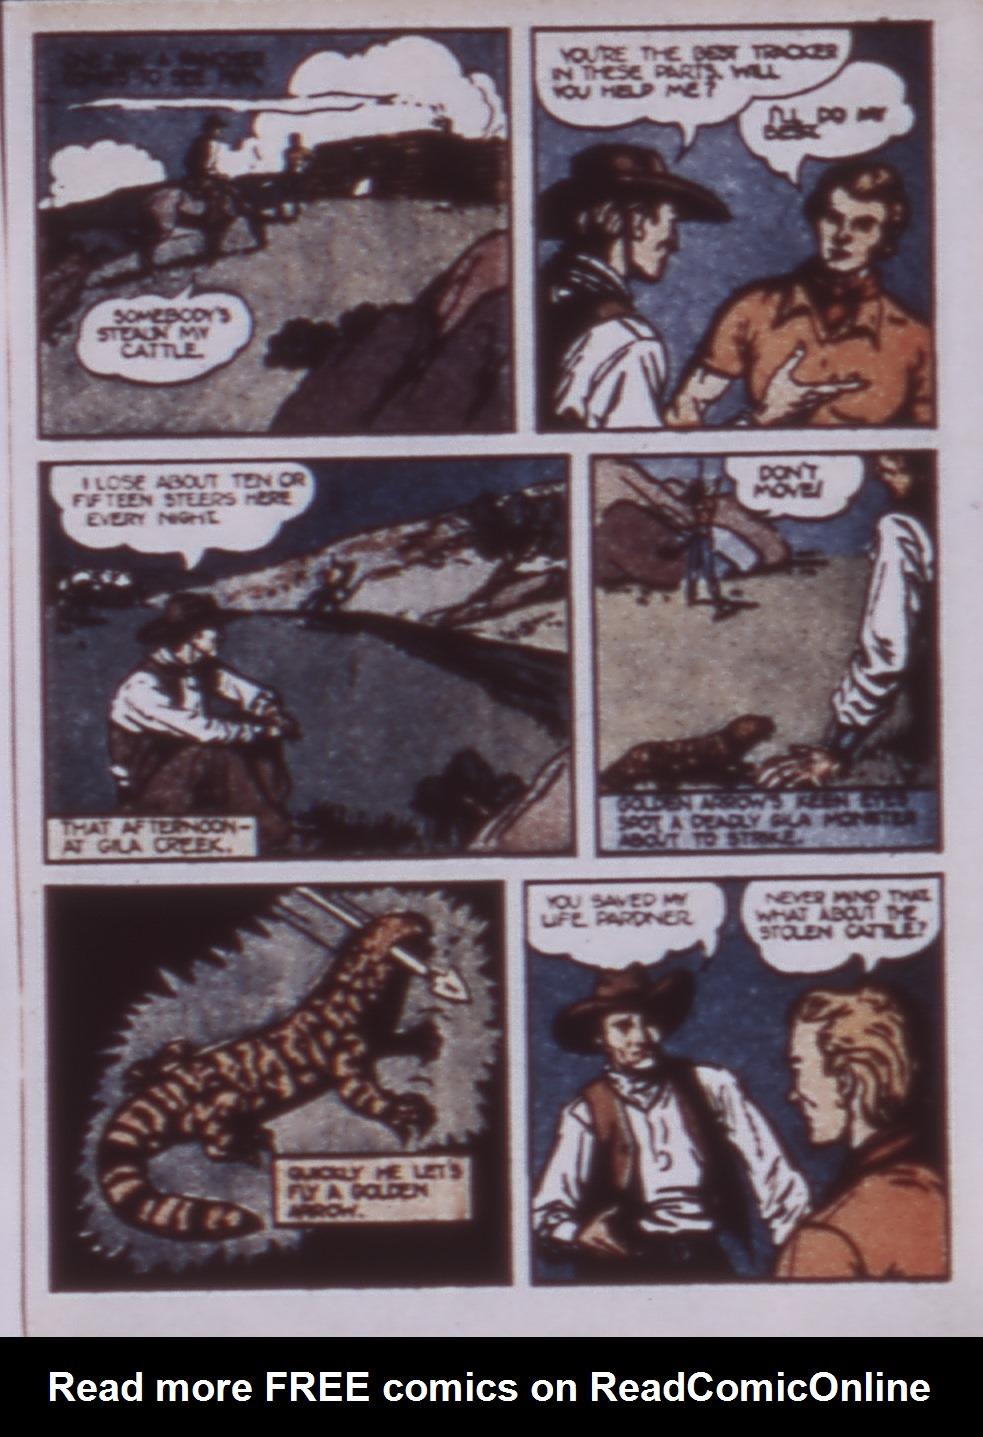 Read online WHIZ Comics comic -  Issue #3 - 17